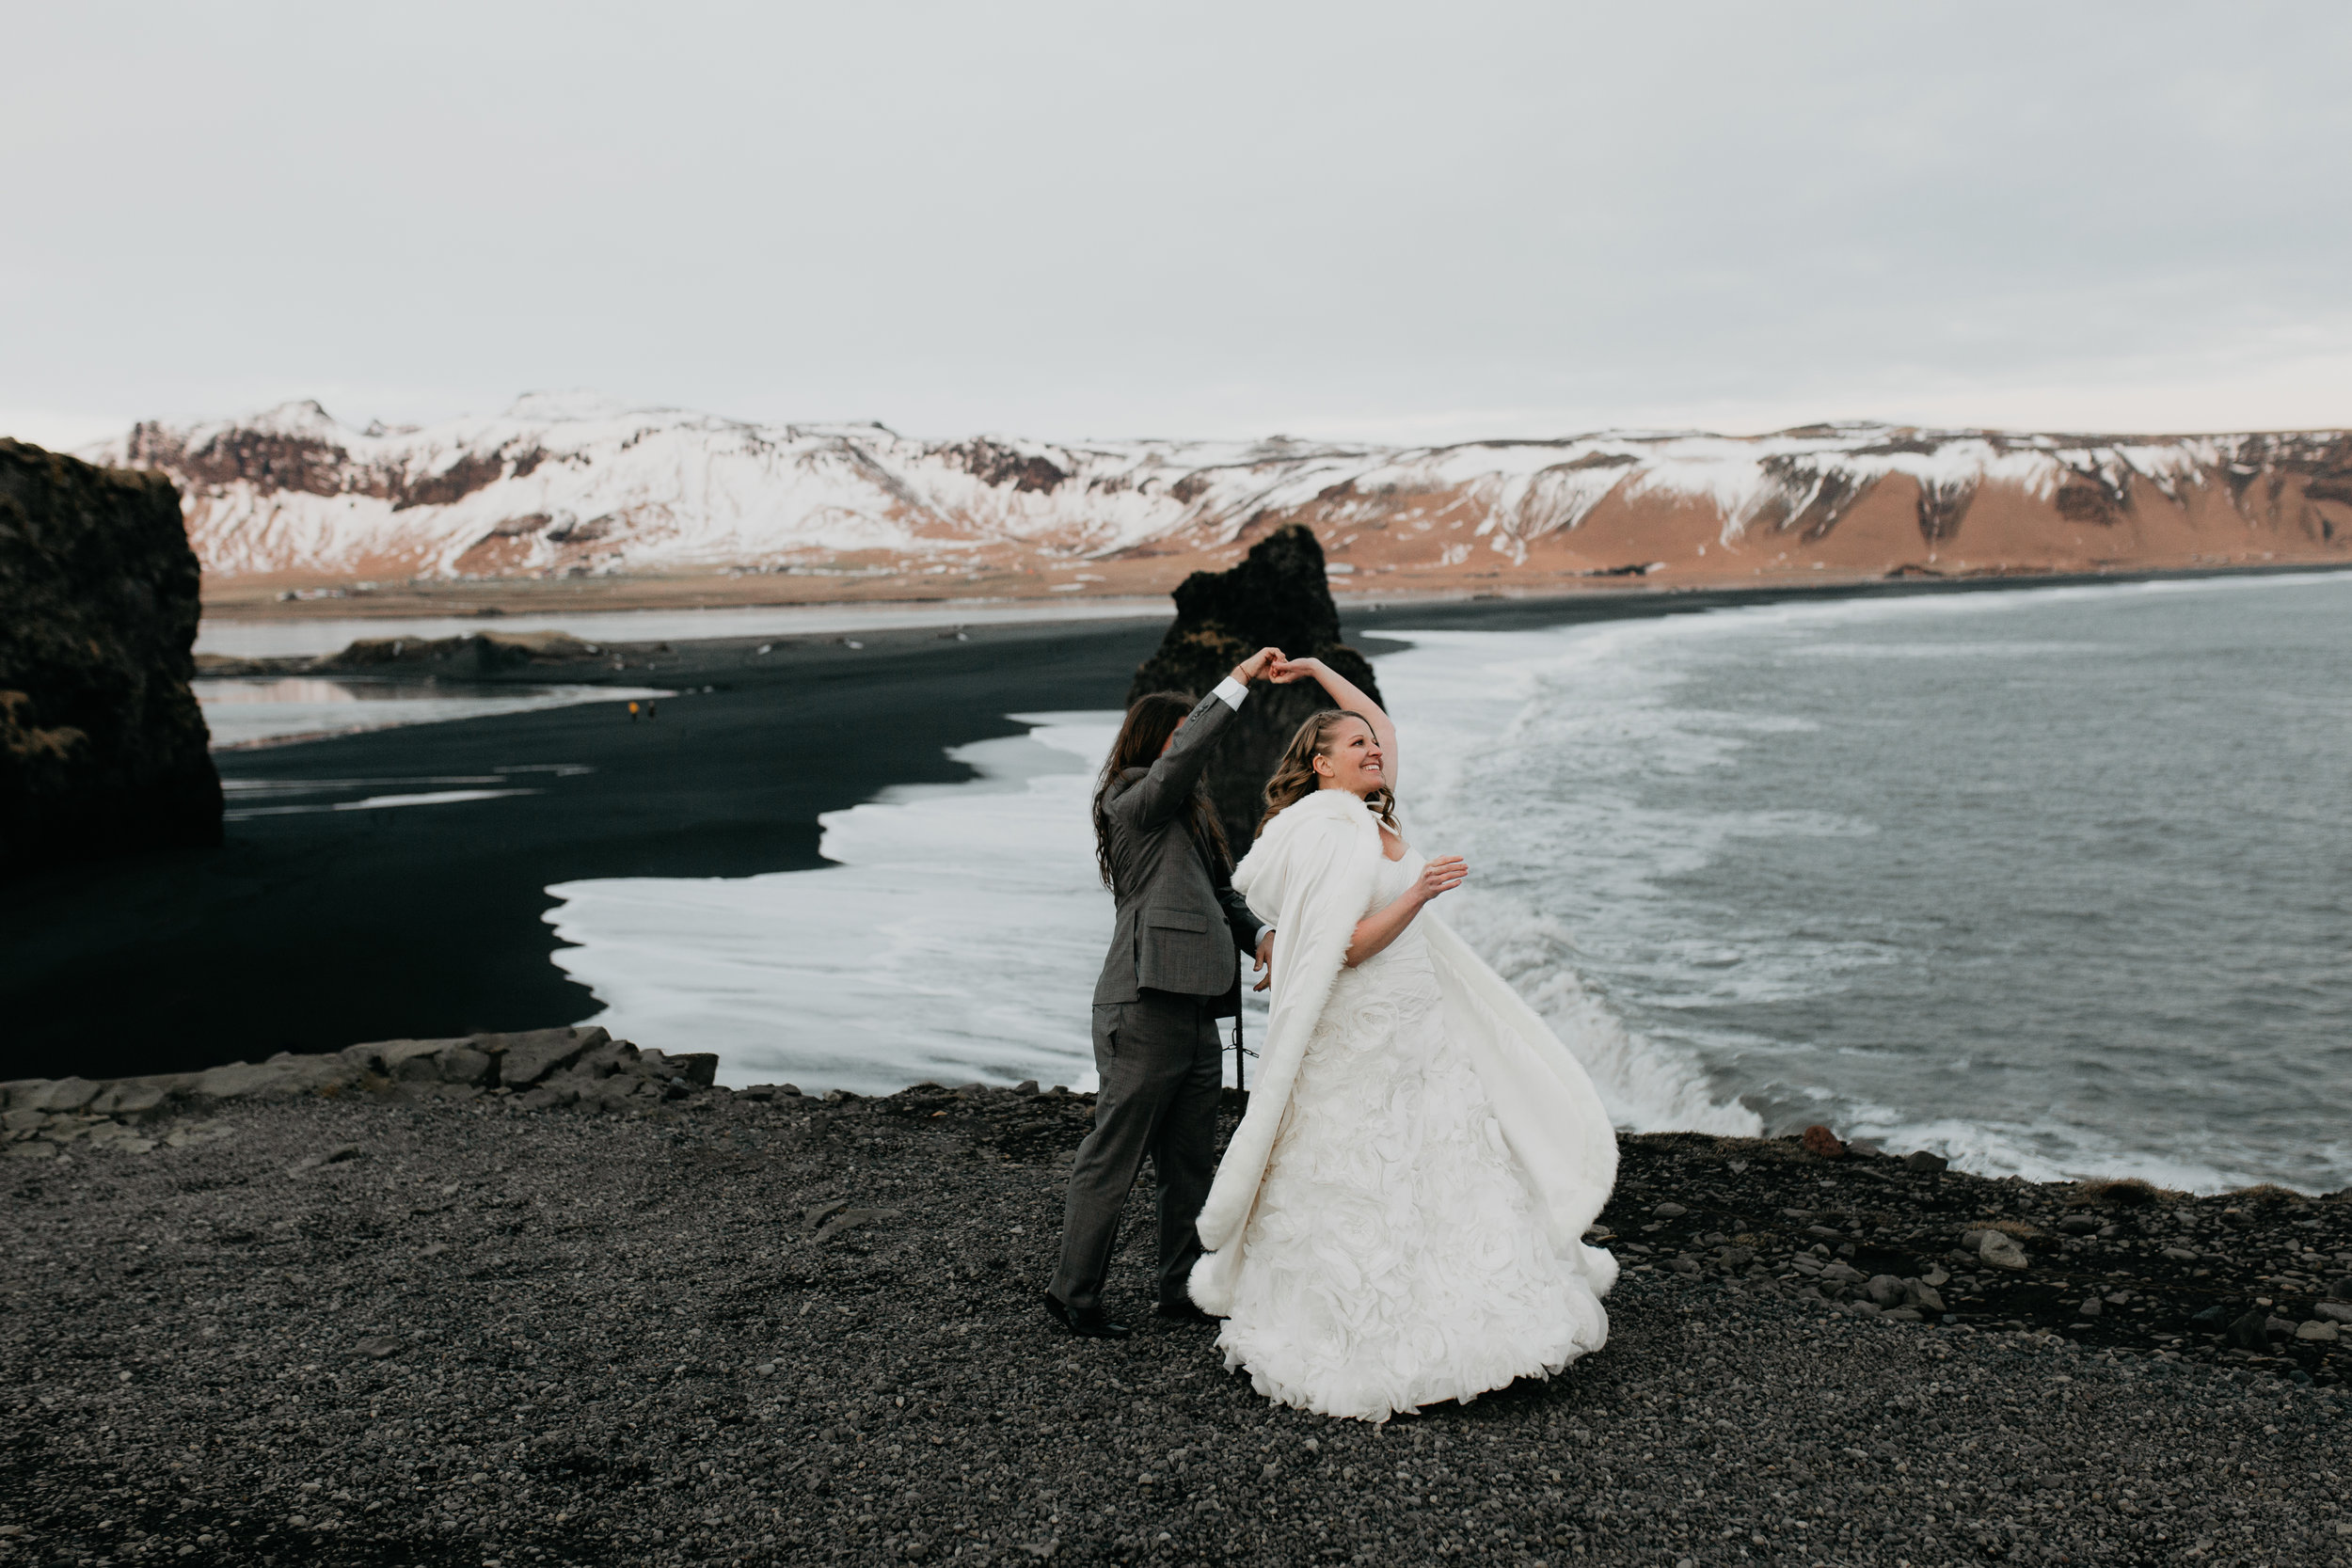 nicole-daacke-photography-iceland-winter-sunset-adventure-elopement-skogafoss-waterfall-black-sand-beach-dyrholaey-vik-iceland-intimate-wedding-black-church-elopement-photographer-50.jpg